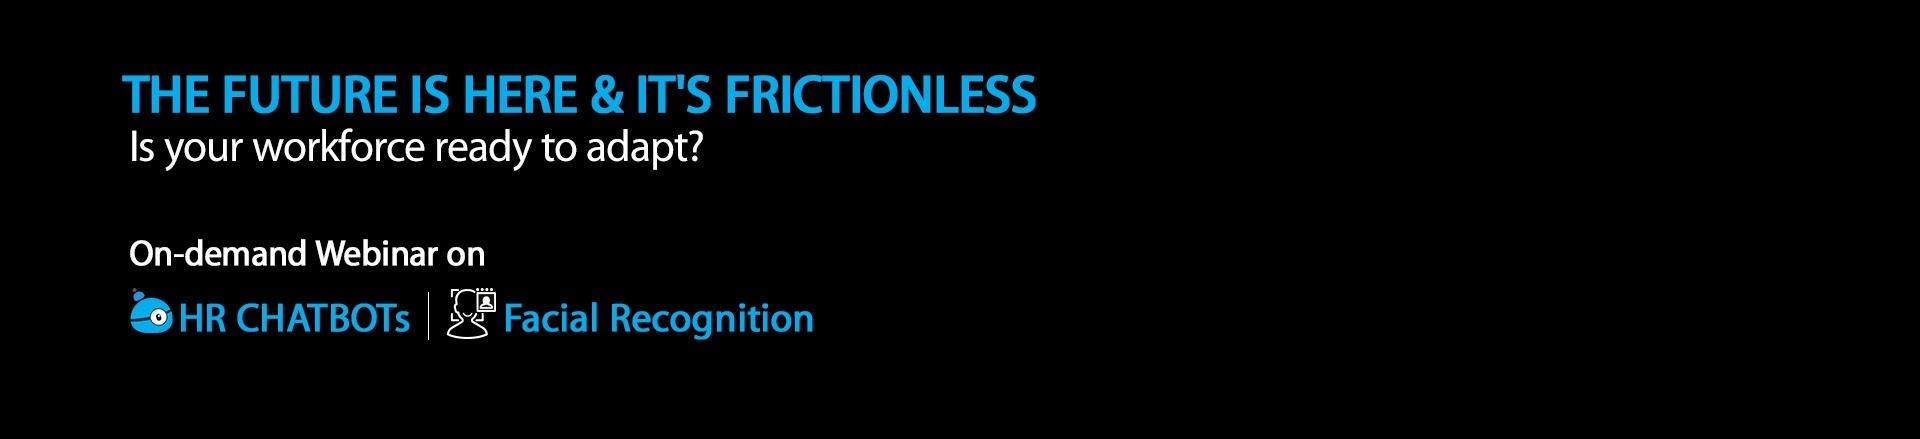 Frictionless-Computing-banner-new.jpg